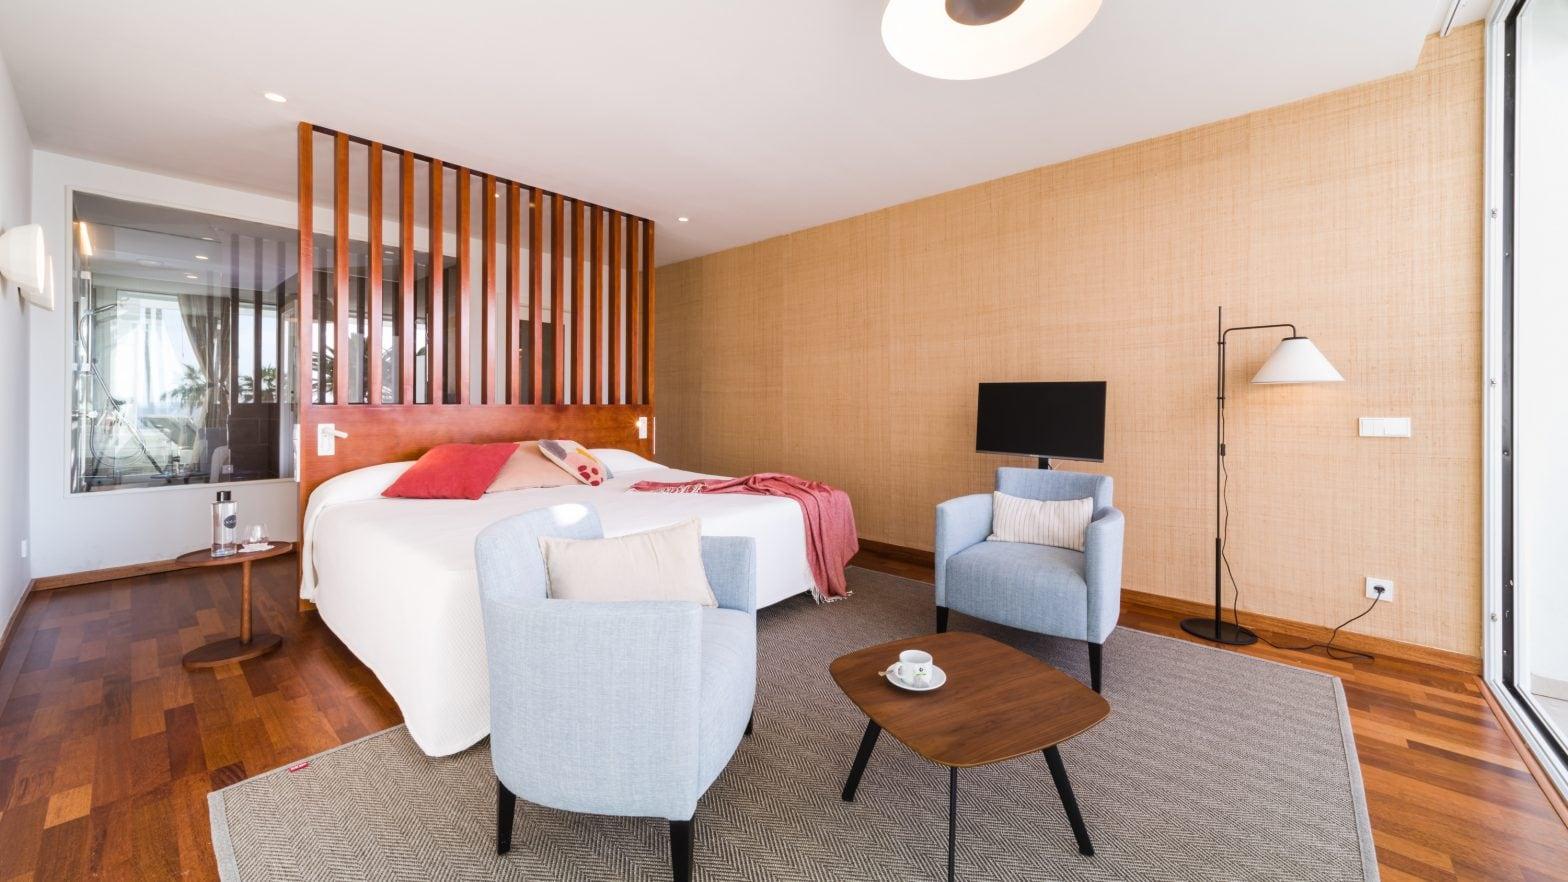 oceano-hotel-tenerife-design-doppelzimmer-1040690